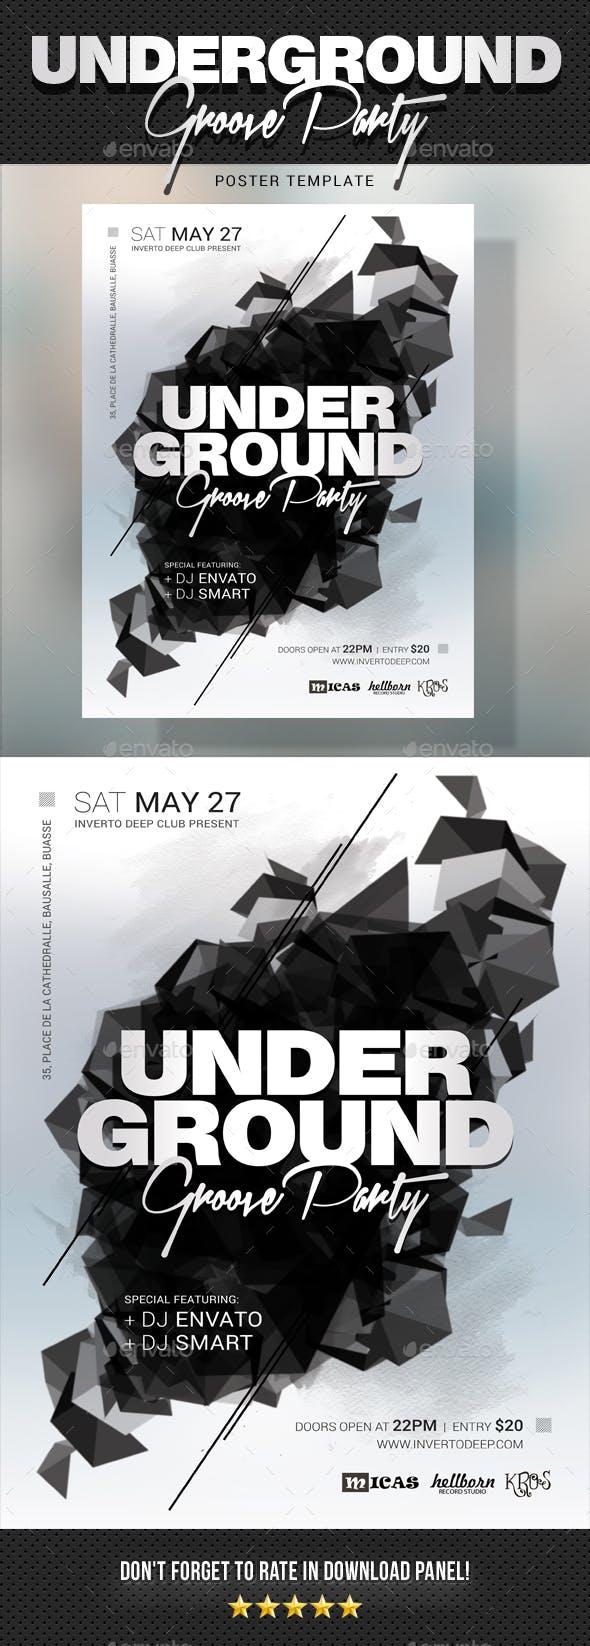 Underground Groove Poster